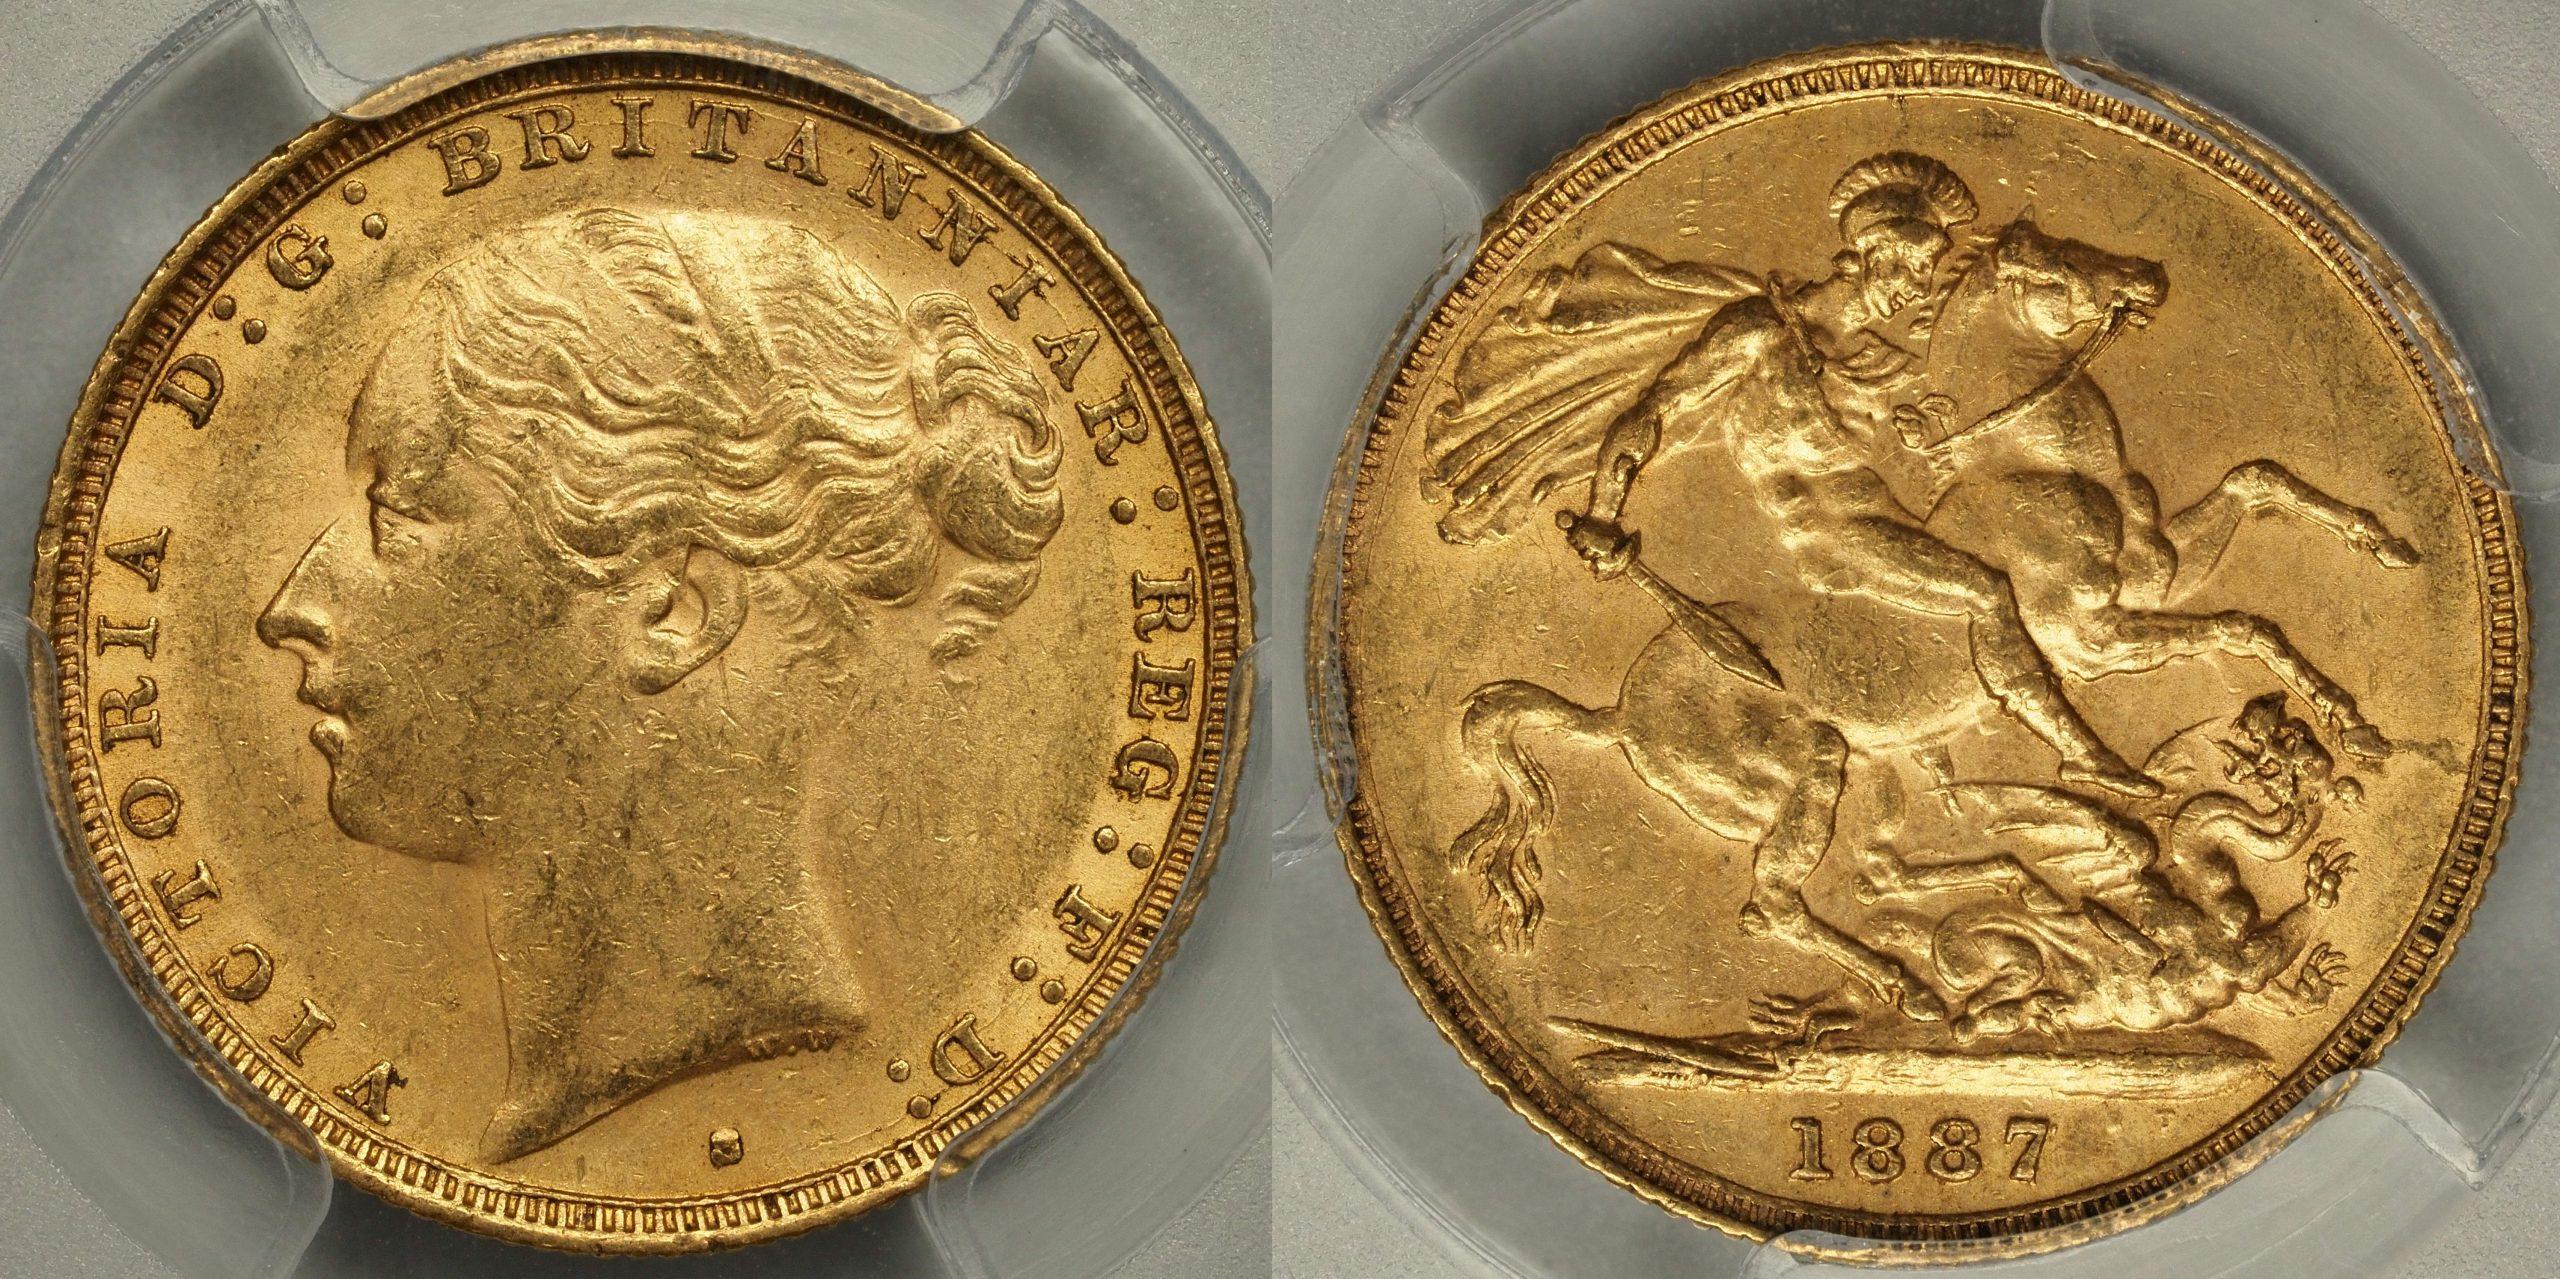 Australia 1887 Sydney Sovereign - PCGS MS61